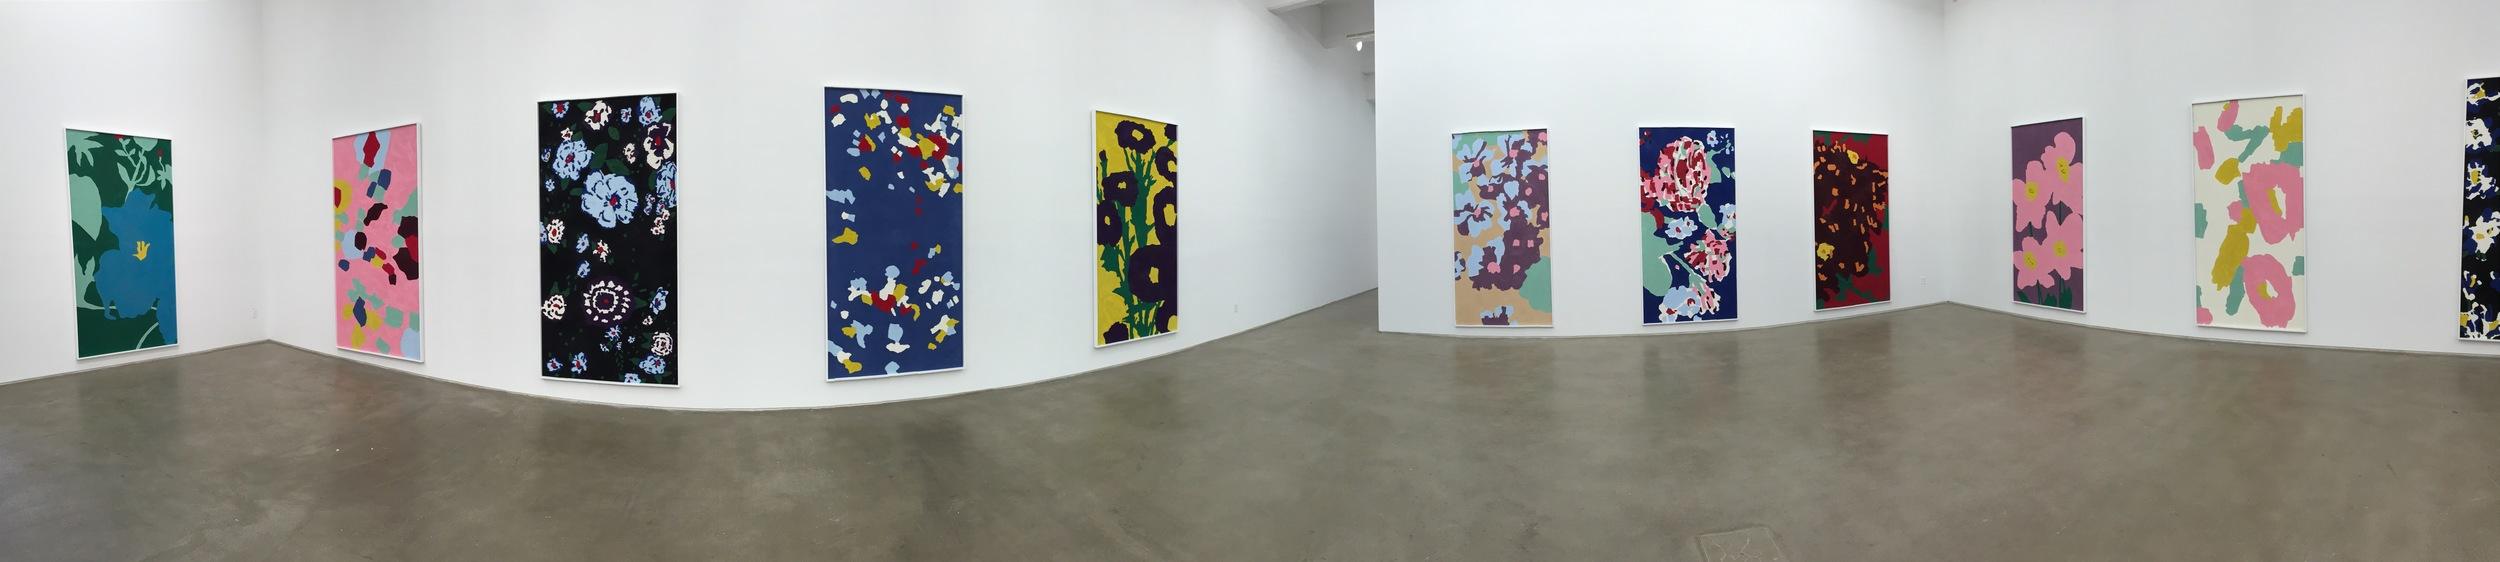 Exhibition Image,  Matthew Chambers  , Zach Feuer Gallery, New York.   Photo Credit:Cincala Art Advisory